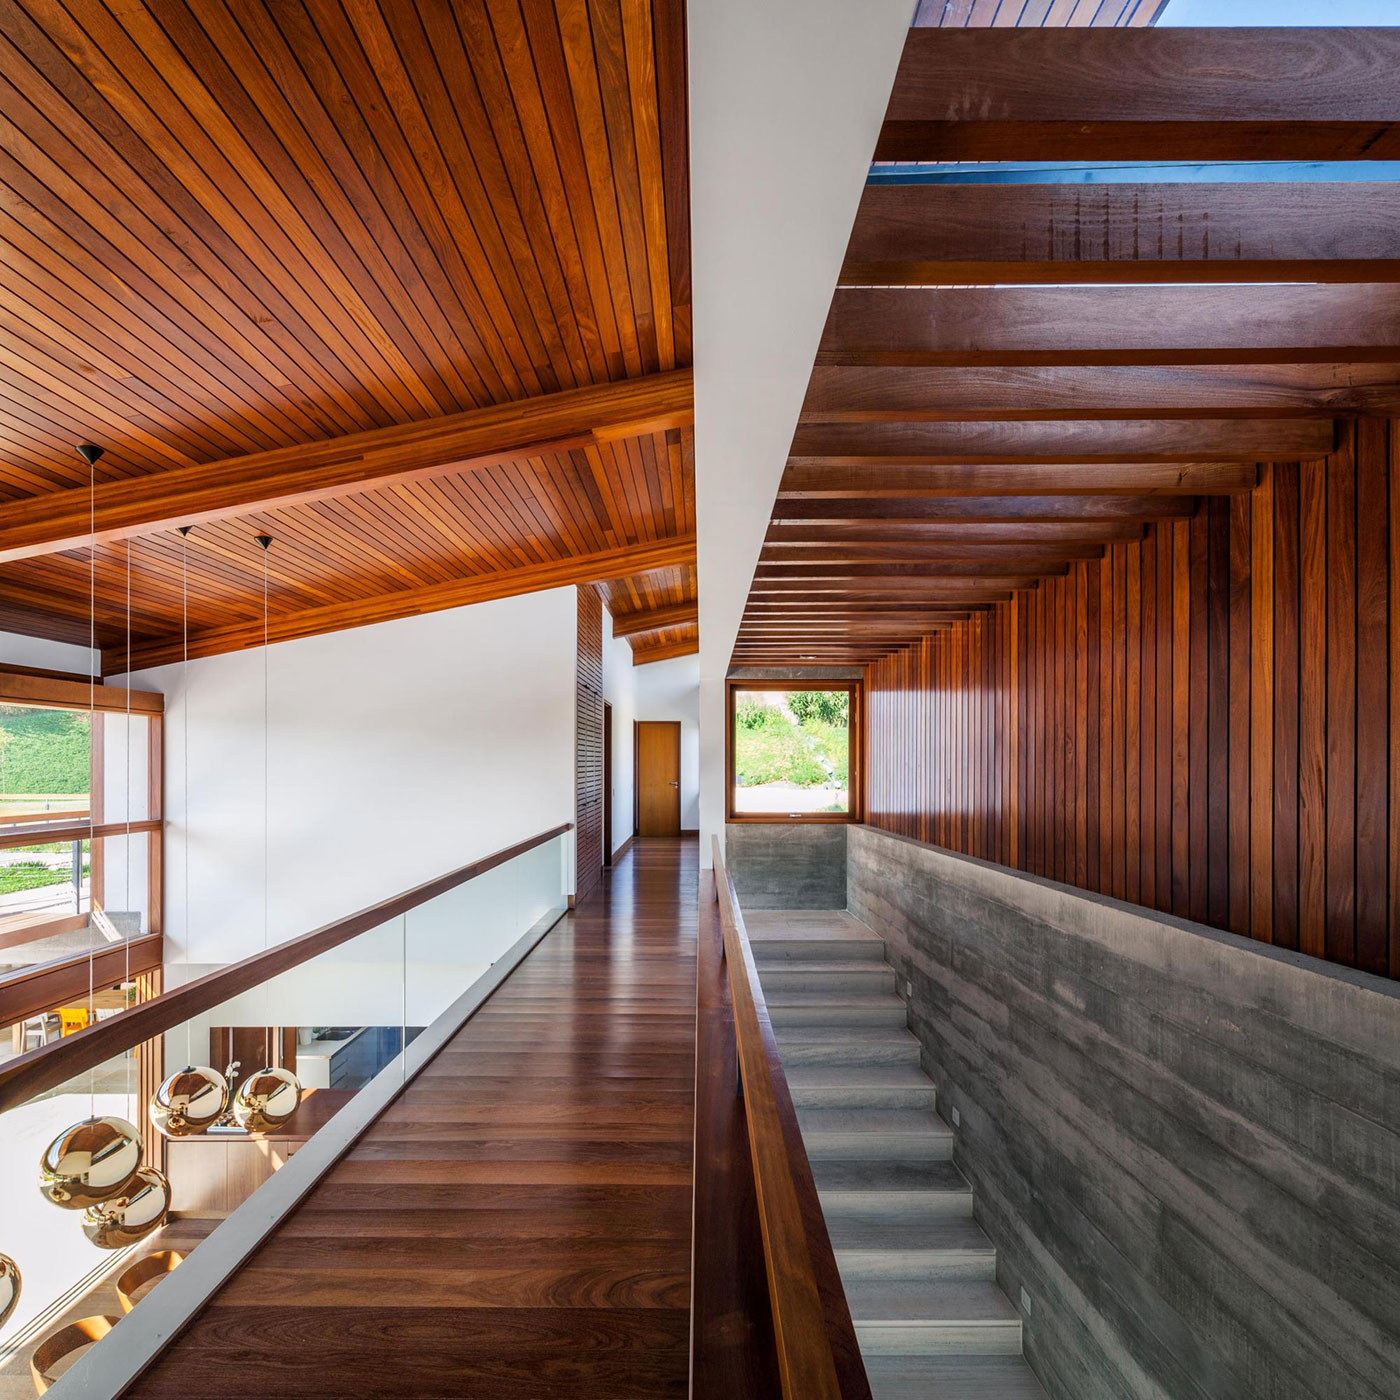 FT Modern Holiday and Weekend House by Reinach Mendonça Arquitetos Associados-11